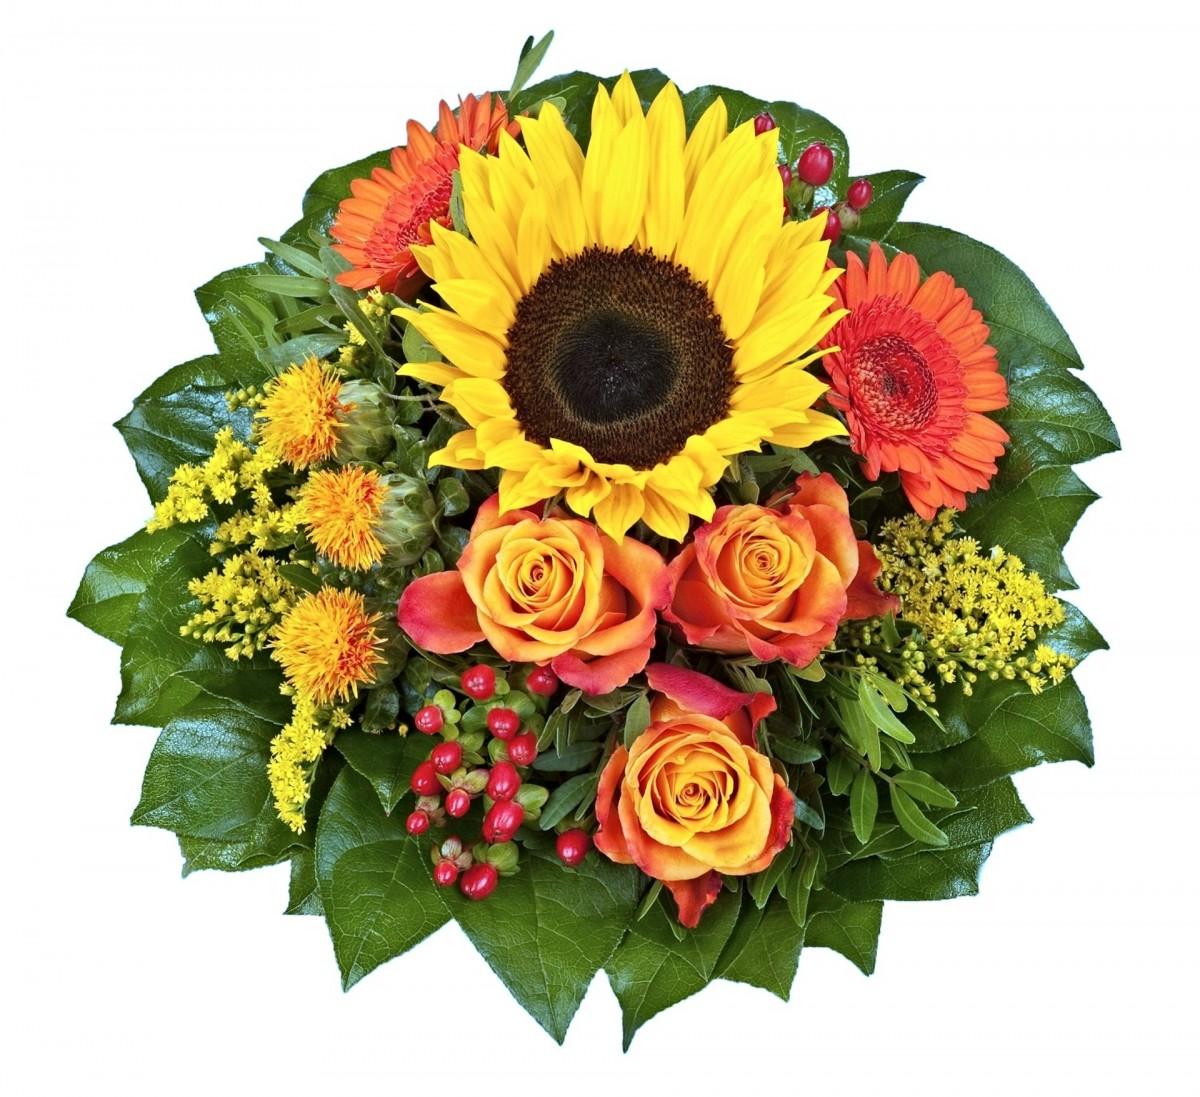 kostenlose foto blume bl tenblatt rose sonnenblume gerbera floristik bl hende pflanze. Black Bedroom Furniture Sets. Home Design Ideas